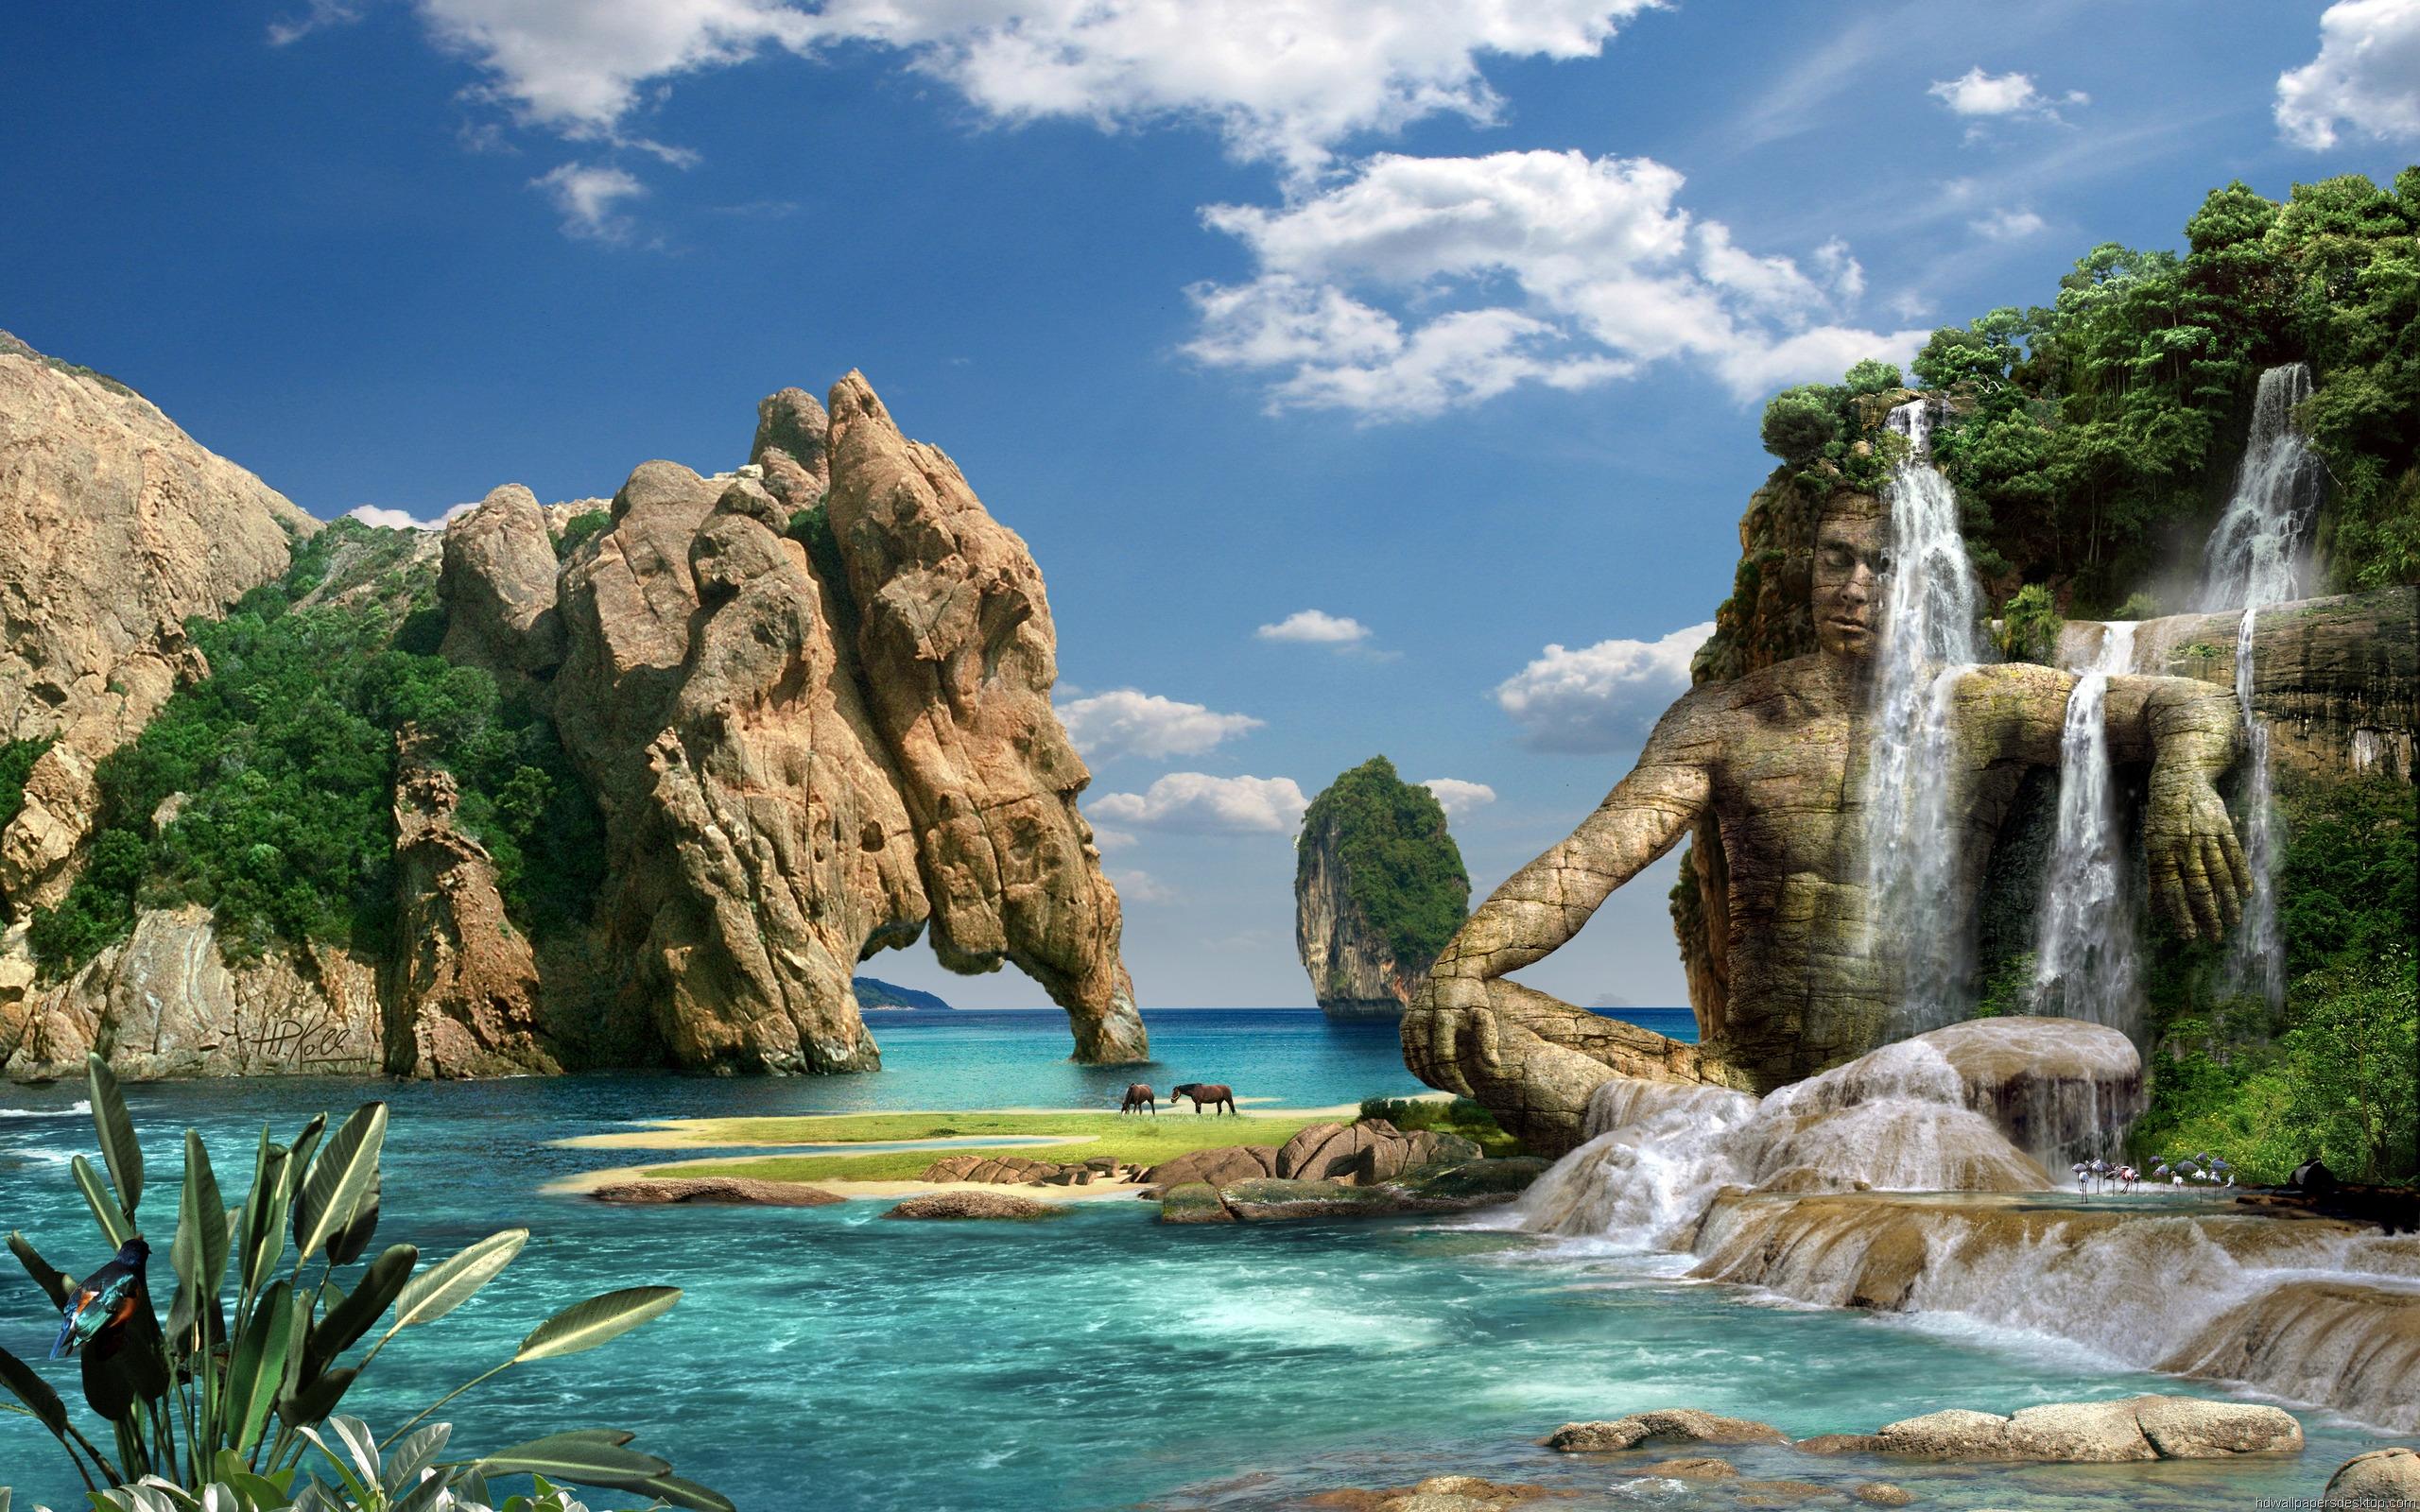 Nature Wallpaper HD Desktop 2560x1600